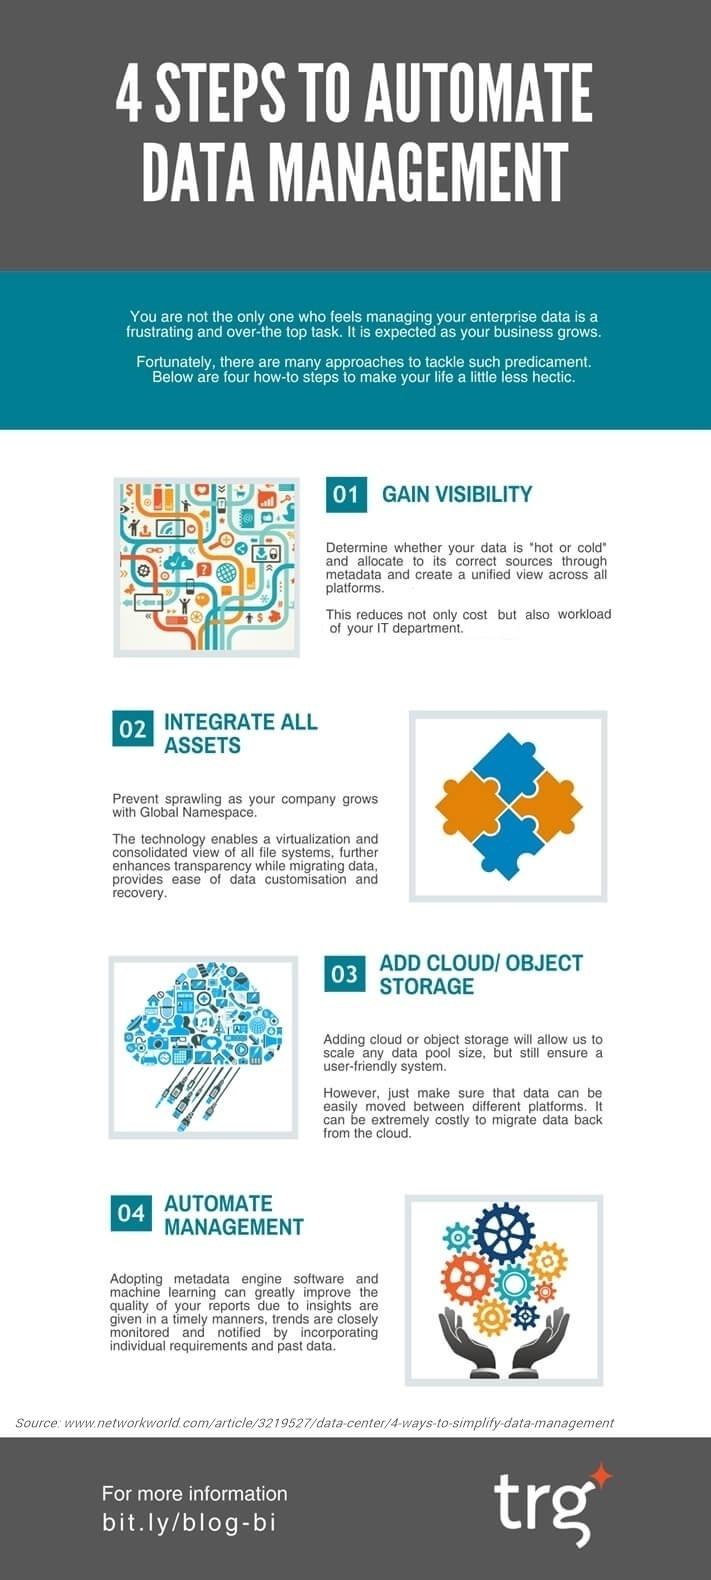 4 steps to automate enterprise data management